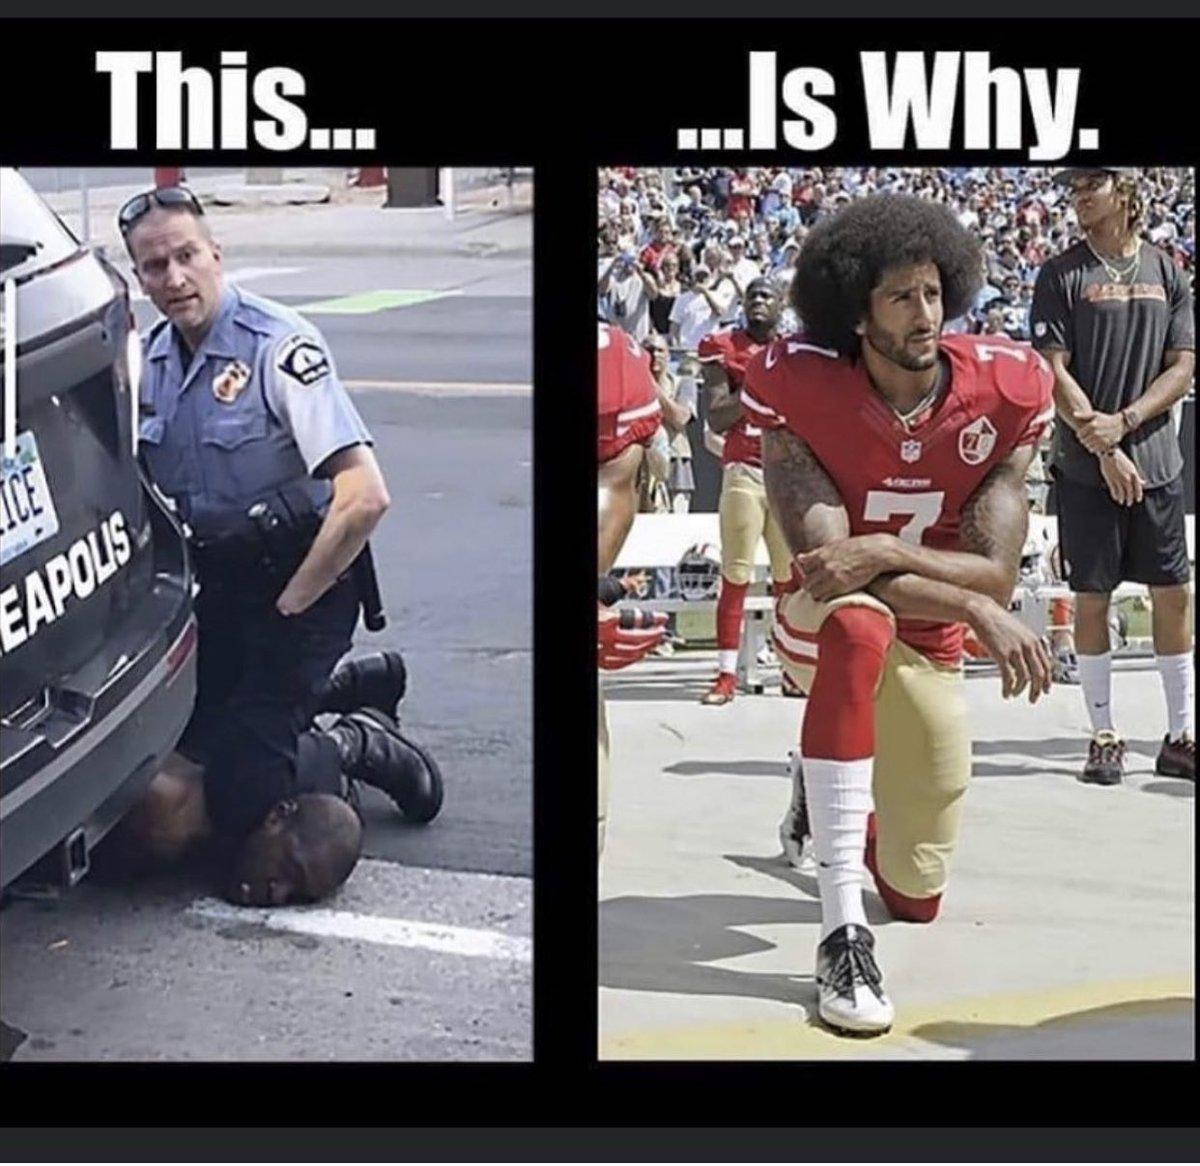 We don't kneel to kill. We kneel for justice. #justiceforfloyd